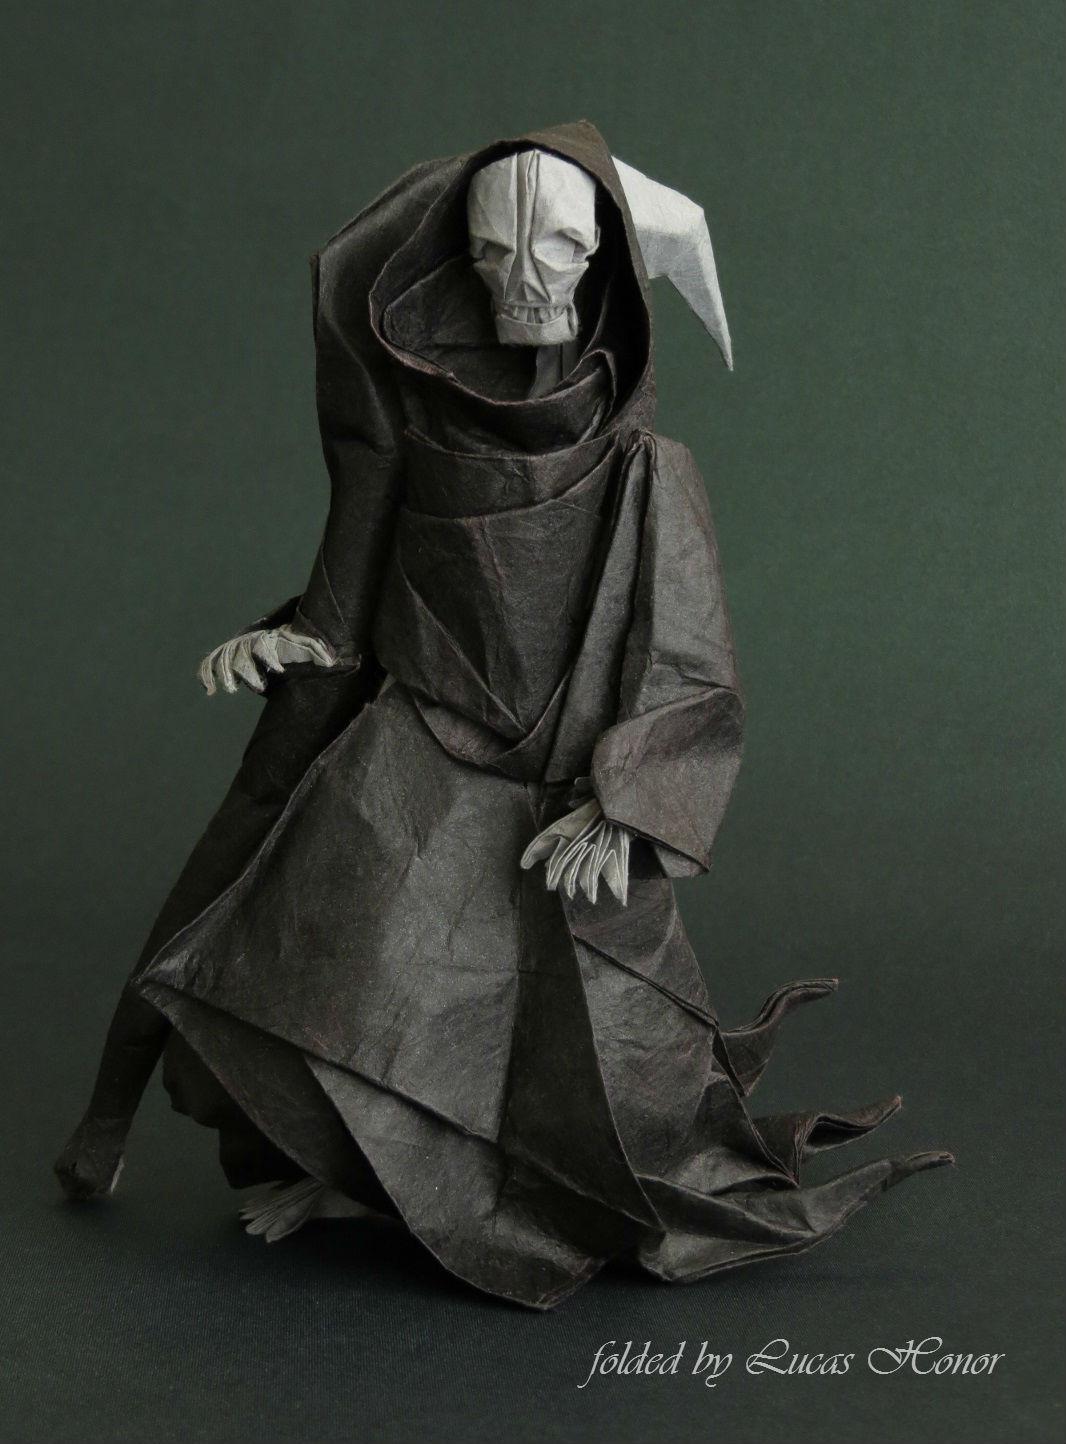 Origami Grim Reaper by Lucas Honor